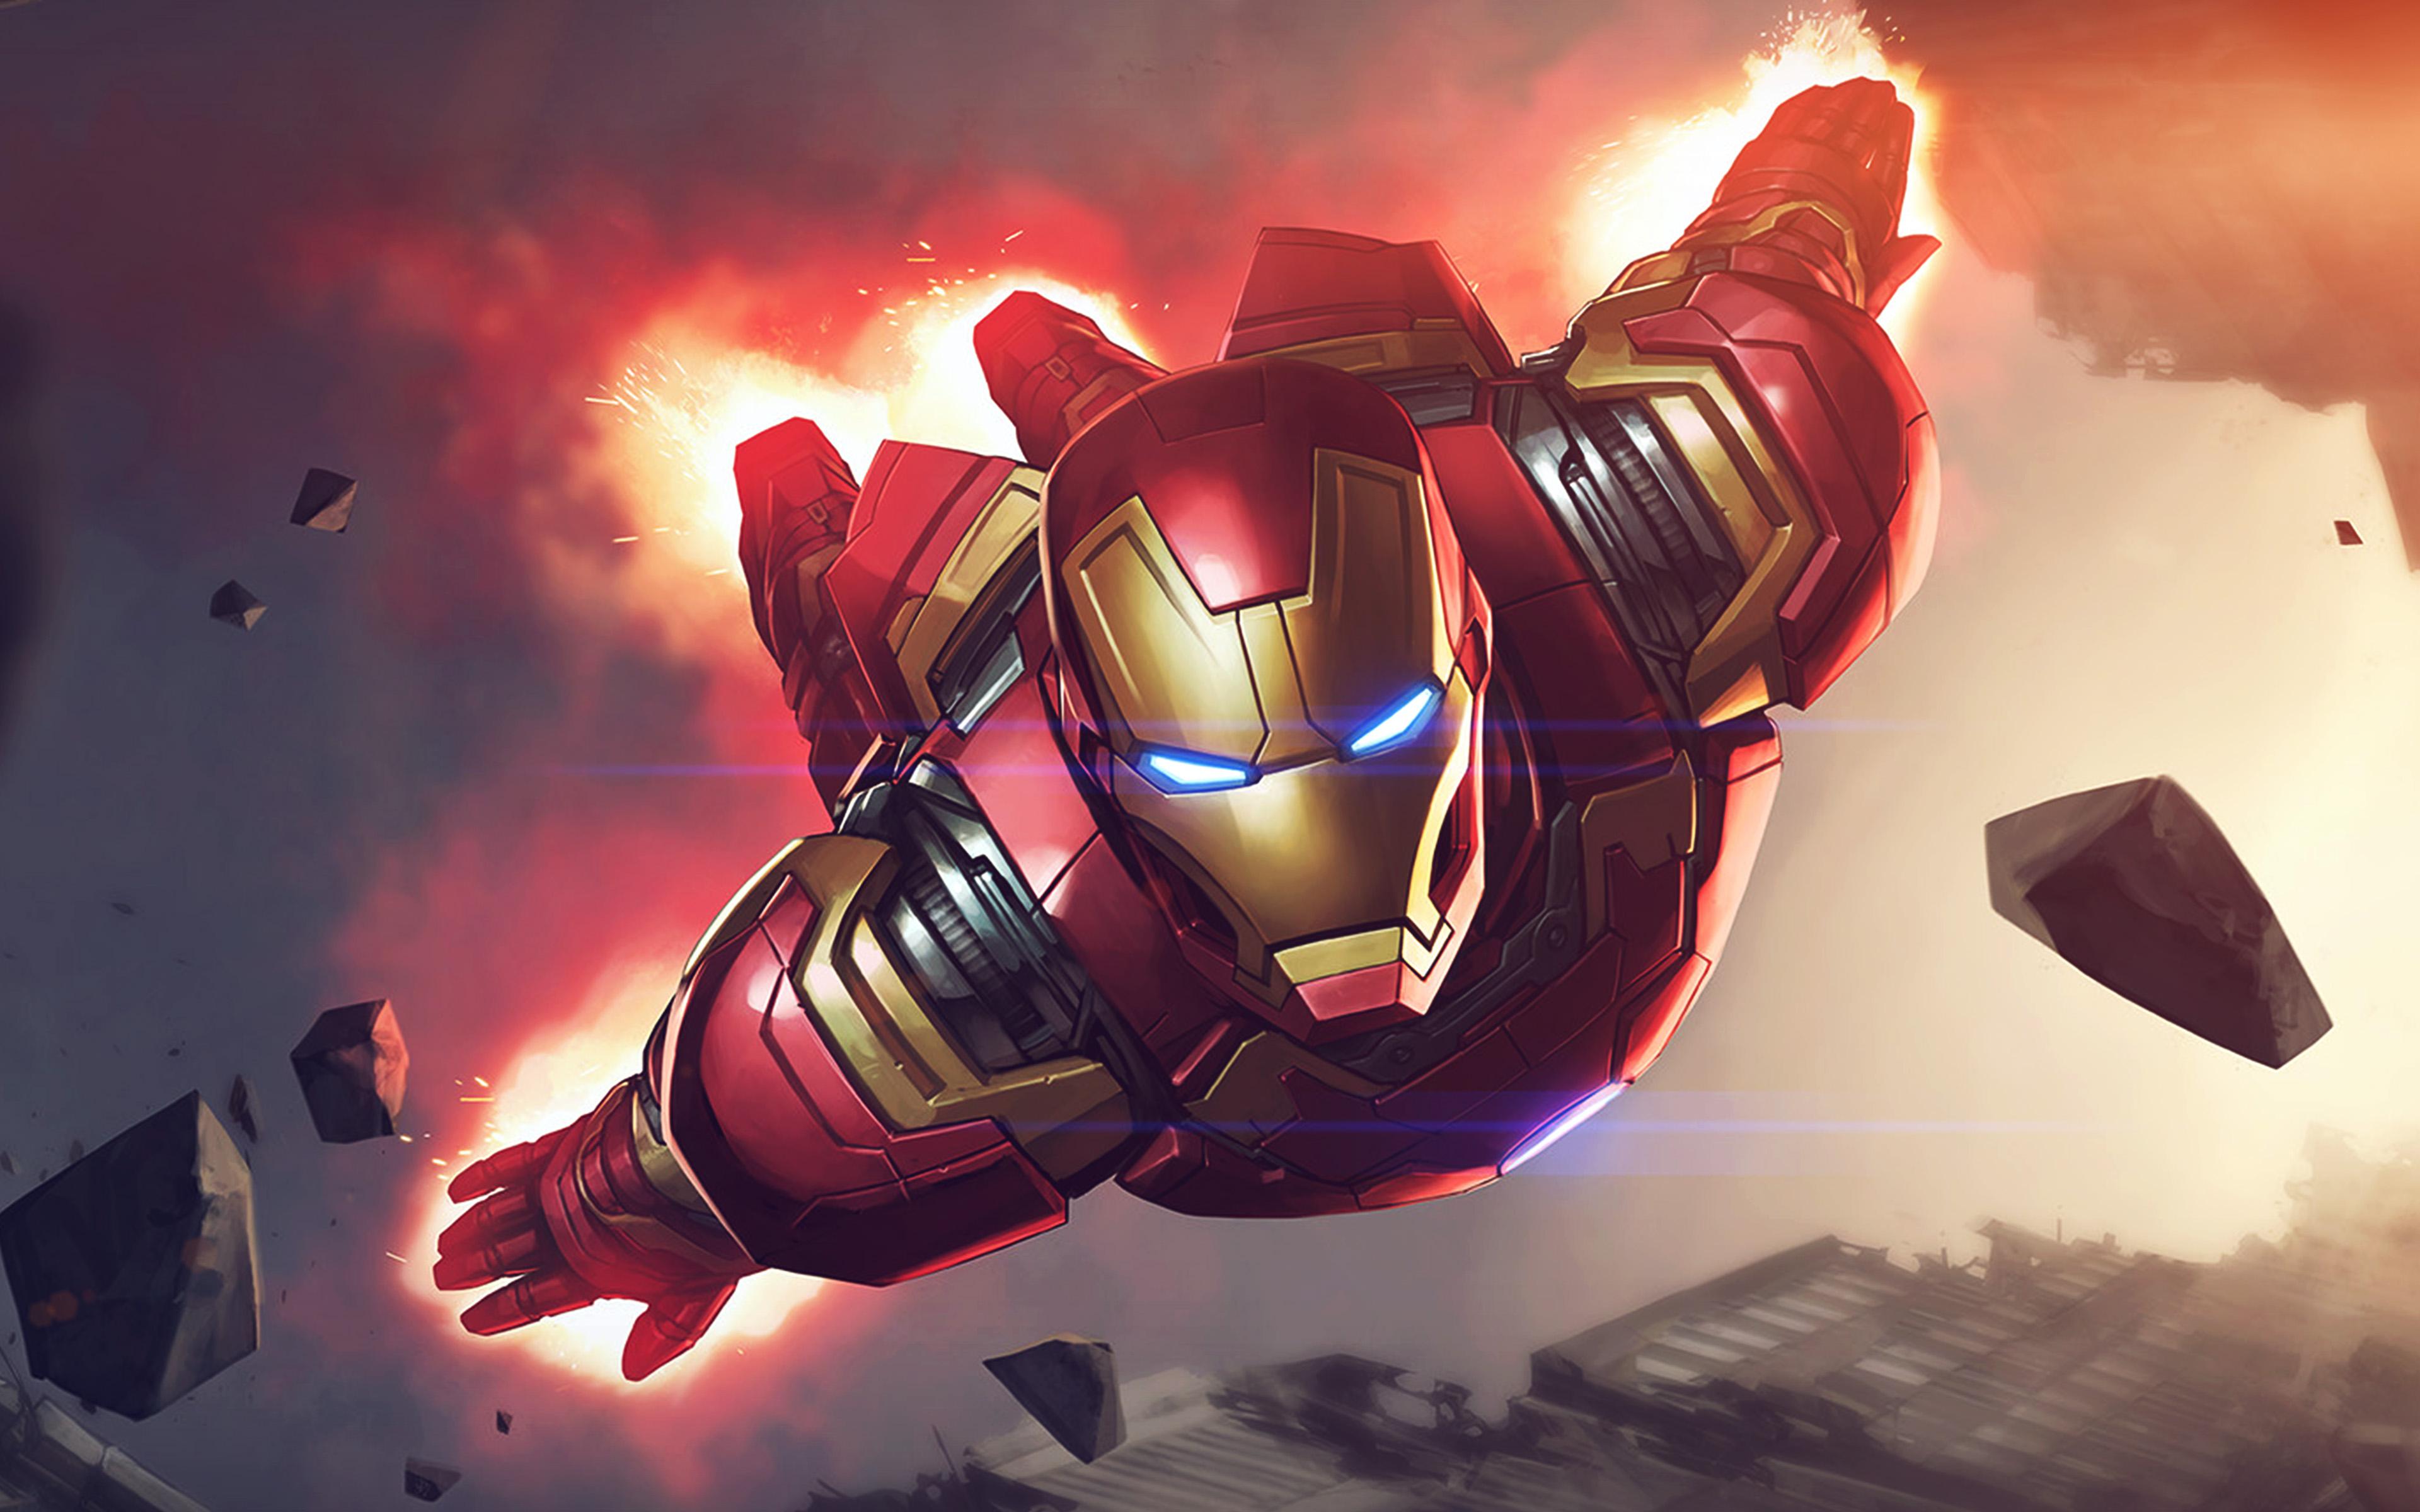 Cool Wallpaper Macbook Iron Man - papers  Image_877796.jpg